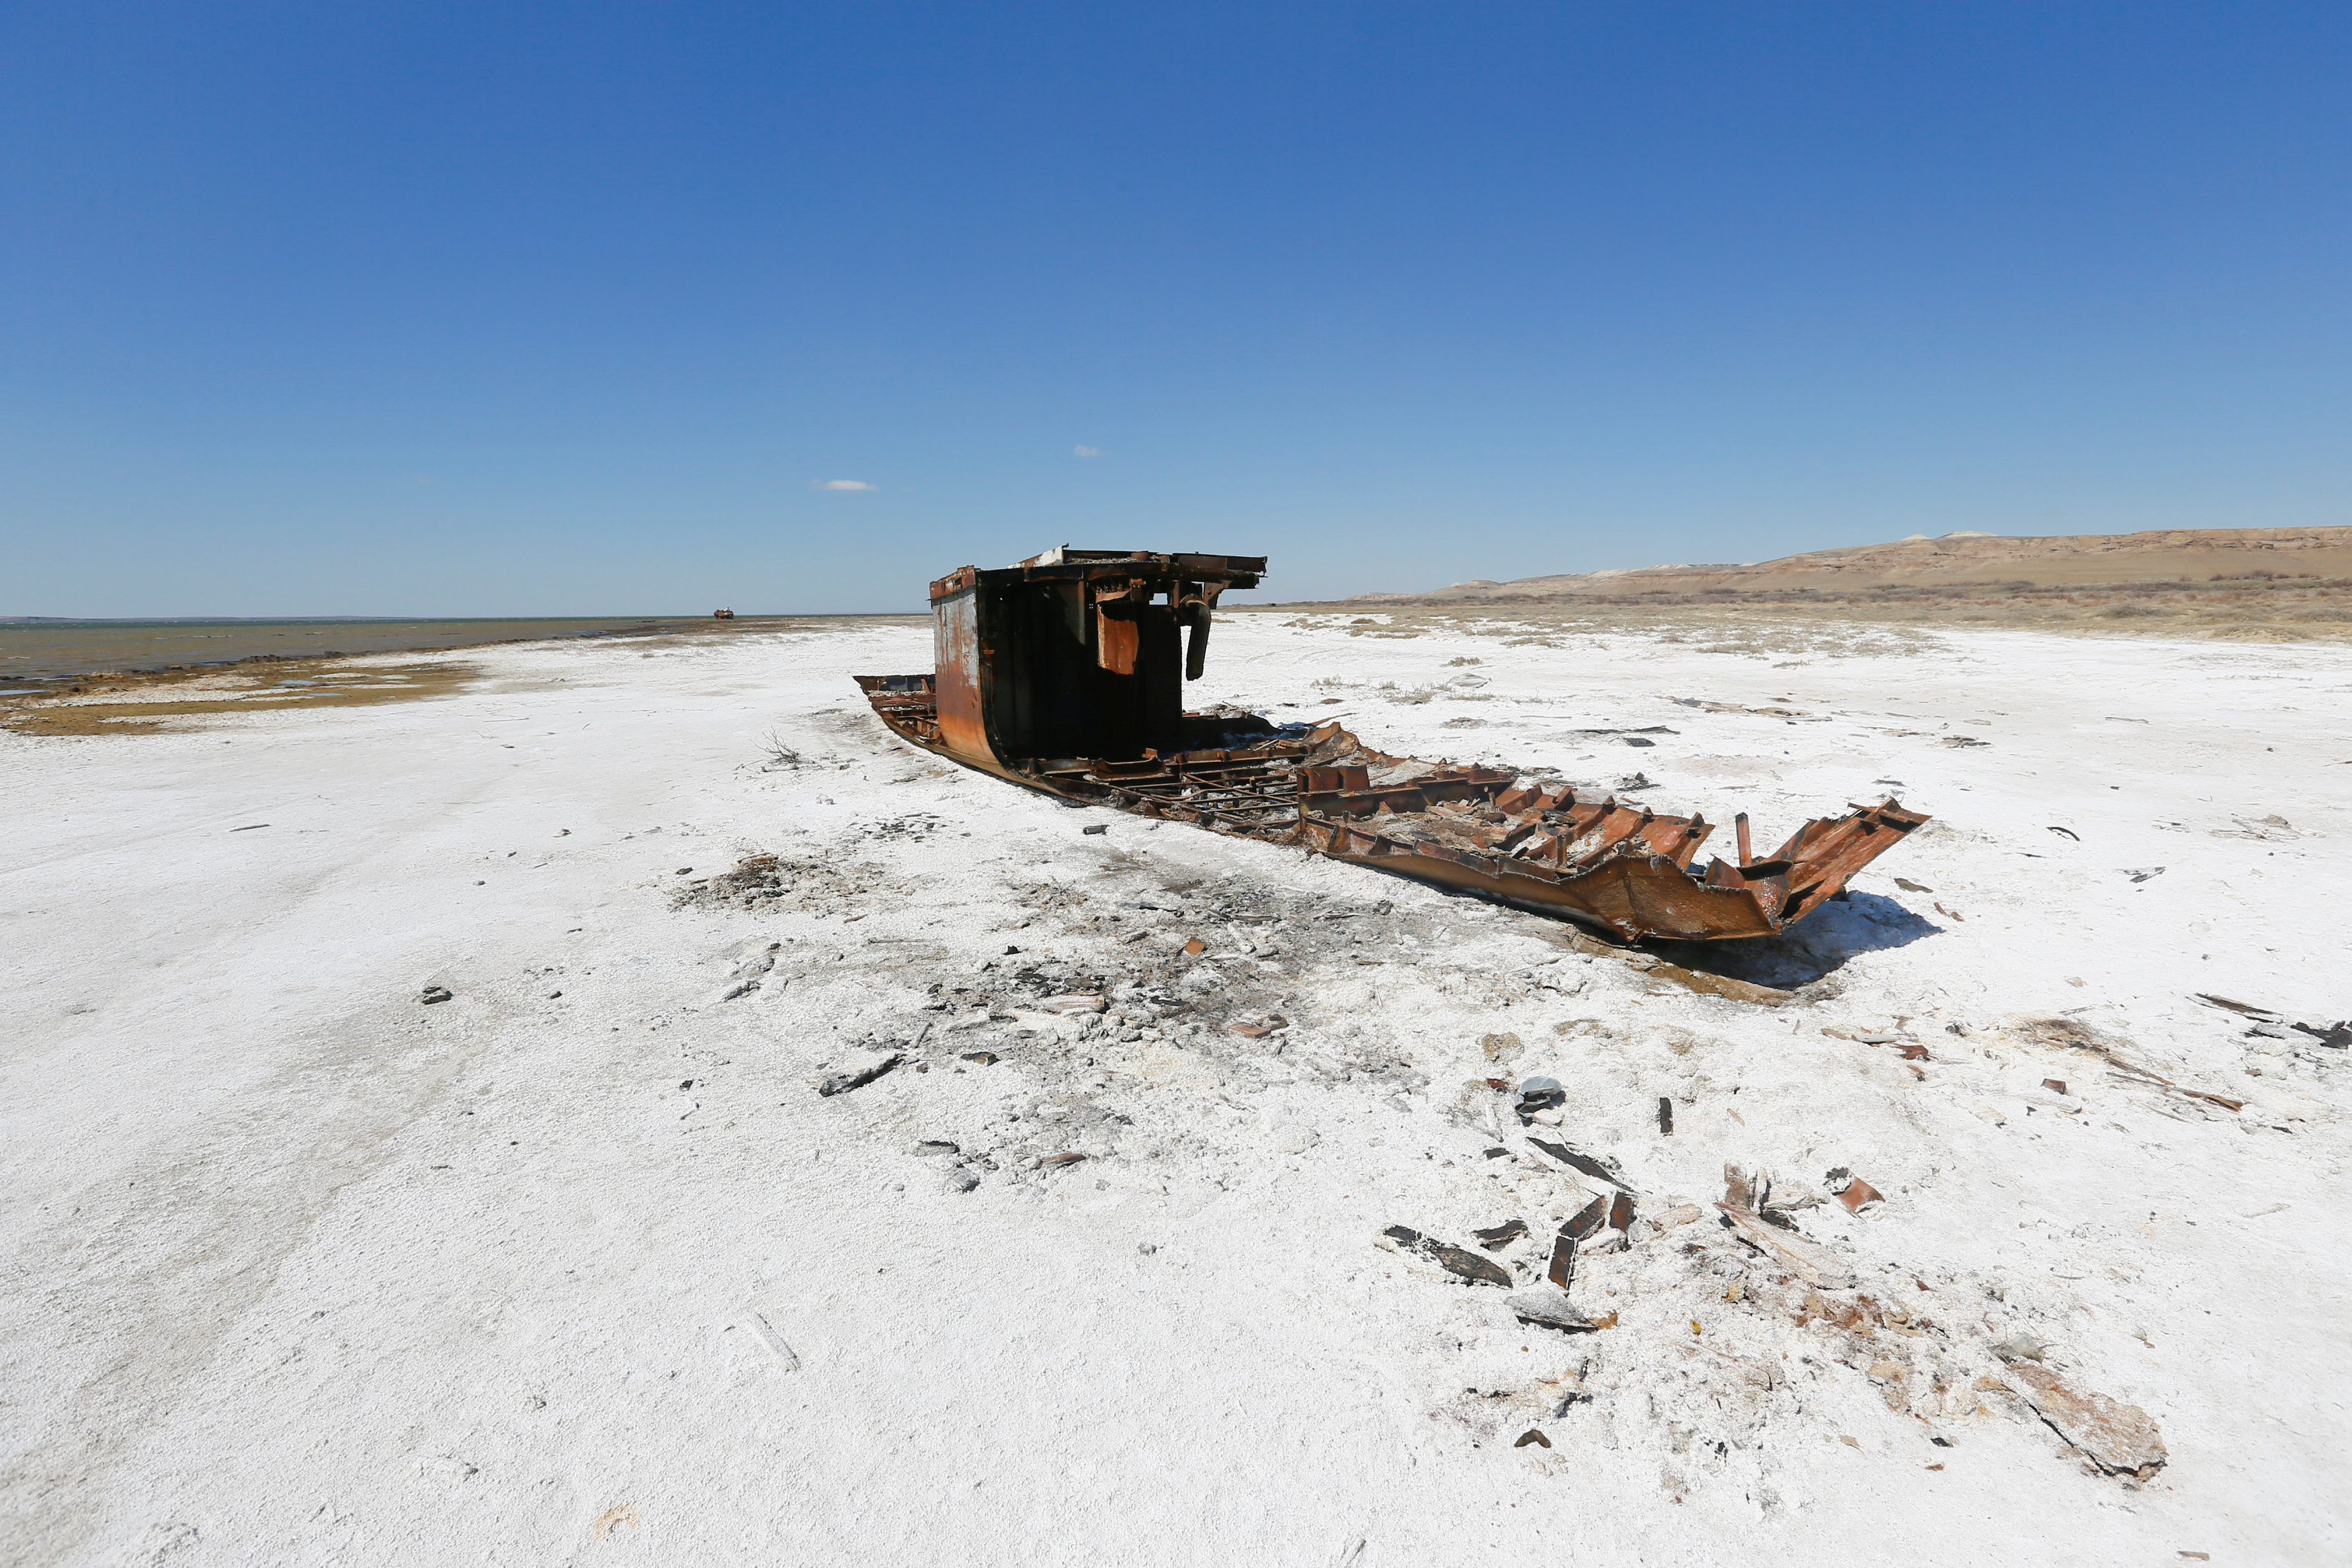 Лодка посреди пустыни. Это Казахстан?